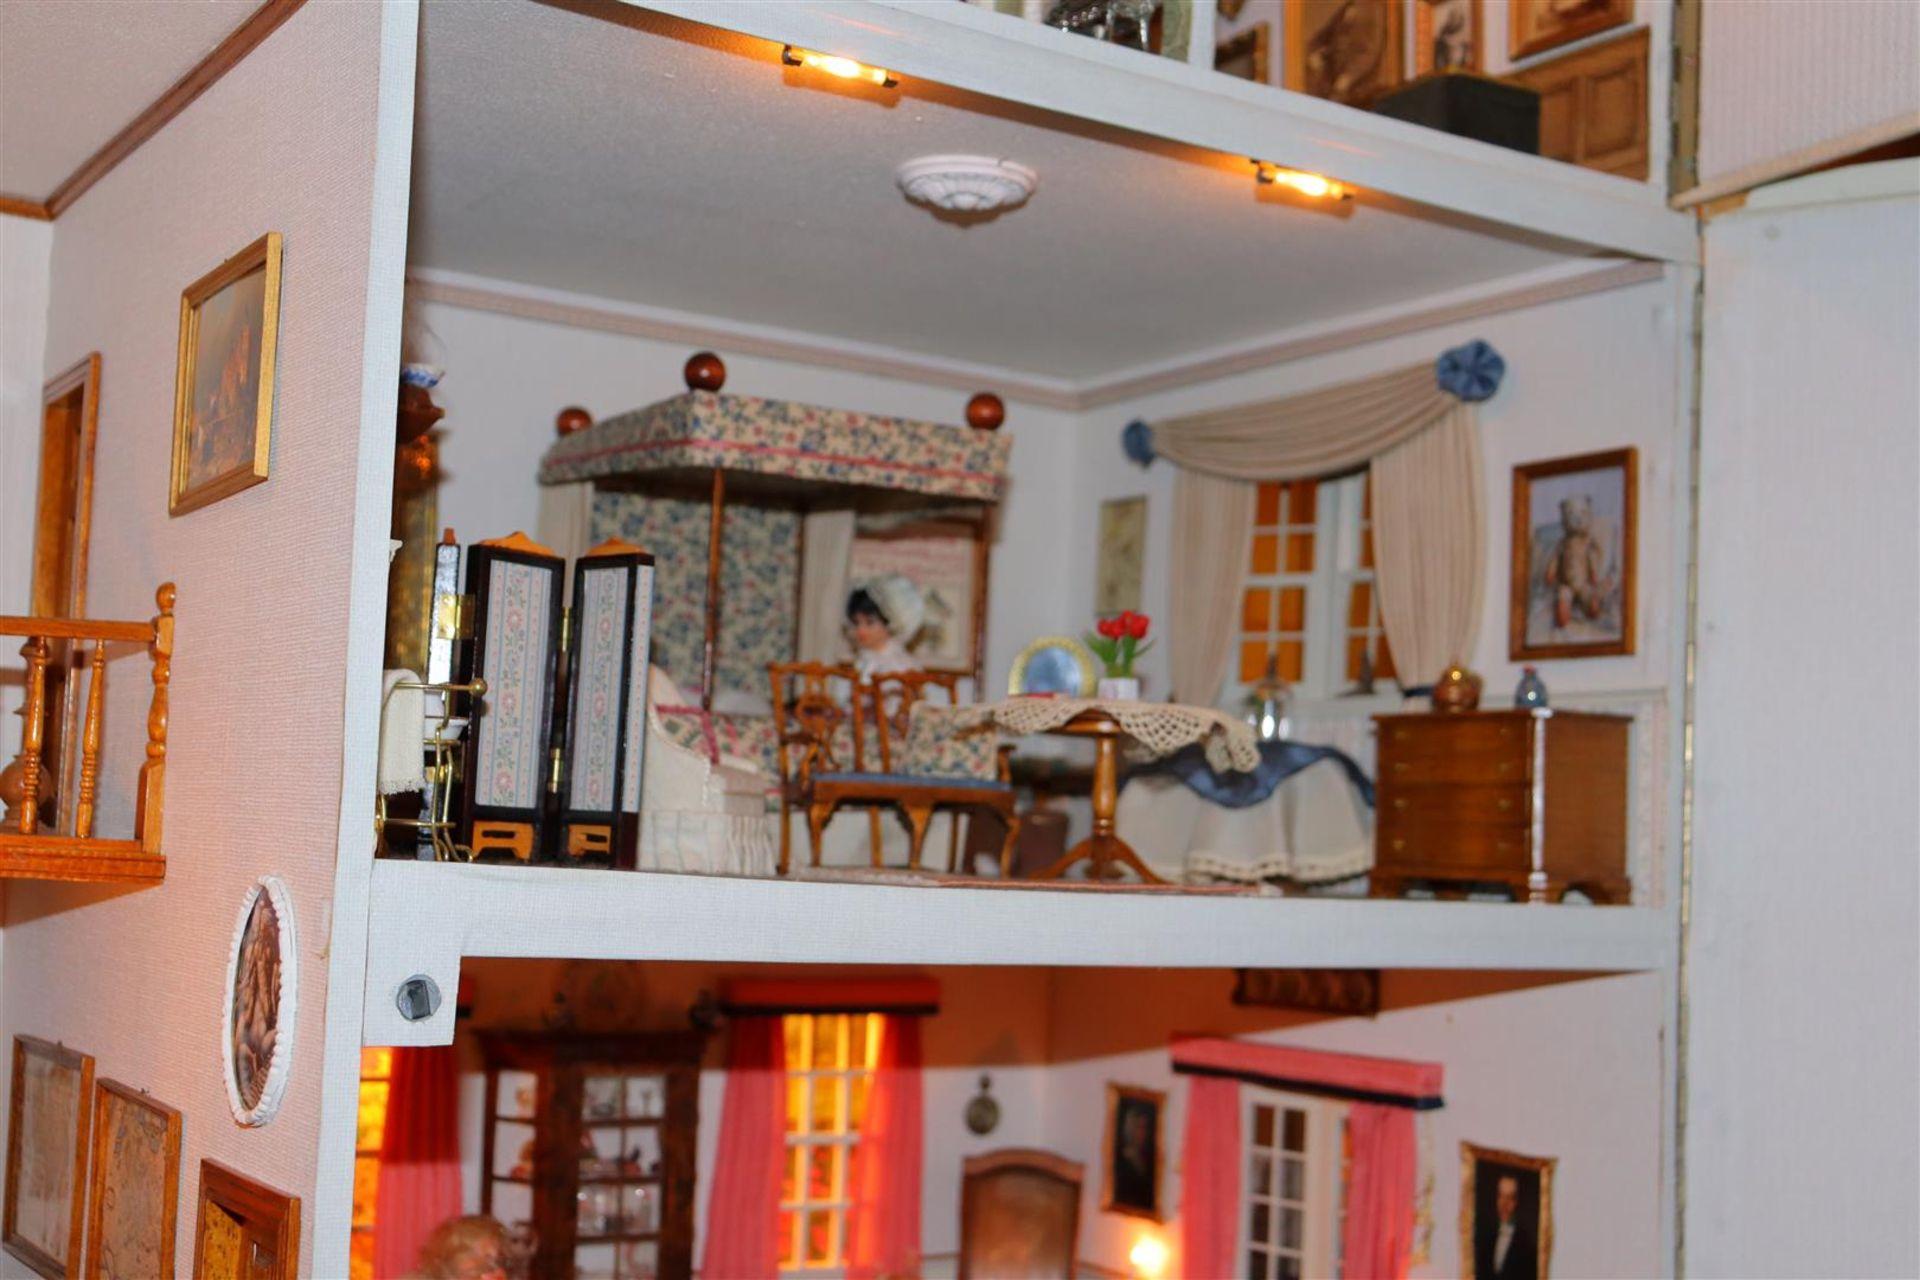 Dollhouse De Kettenborgh by Mrs. J C Wirix Kettenborg - Image 38 of 106